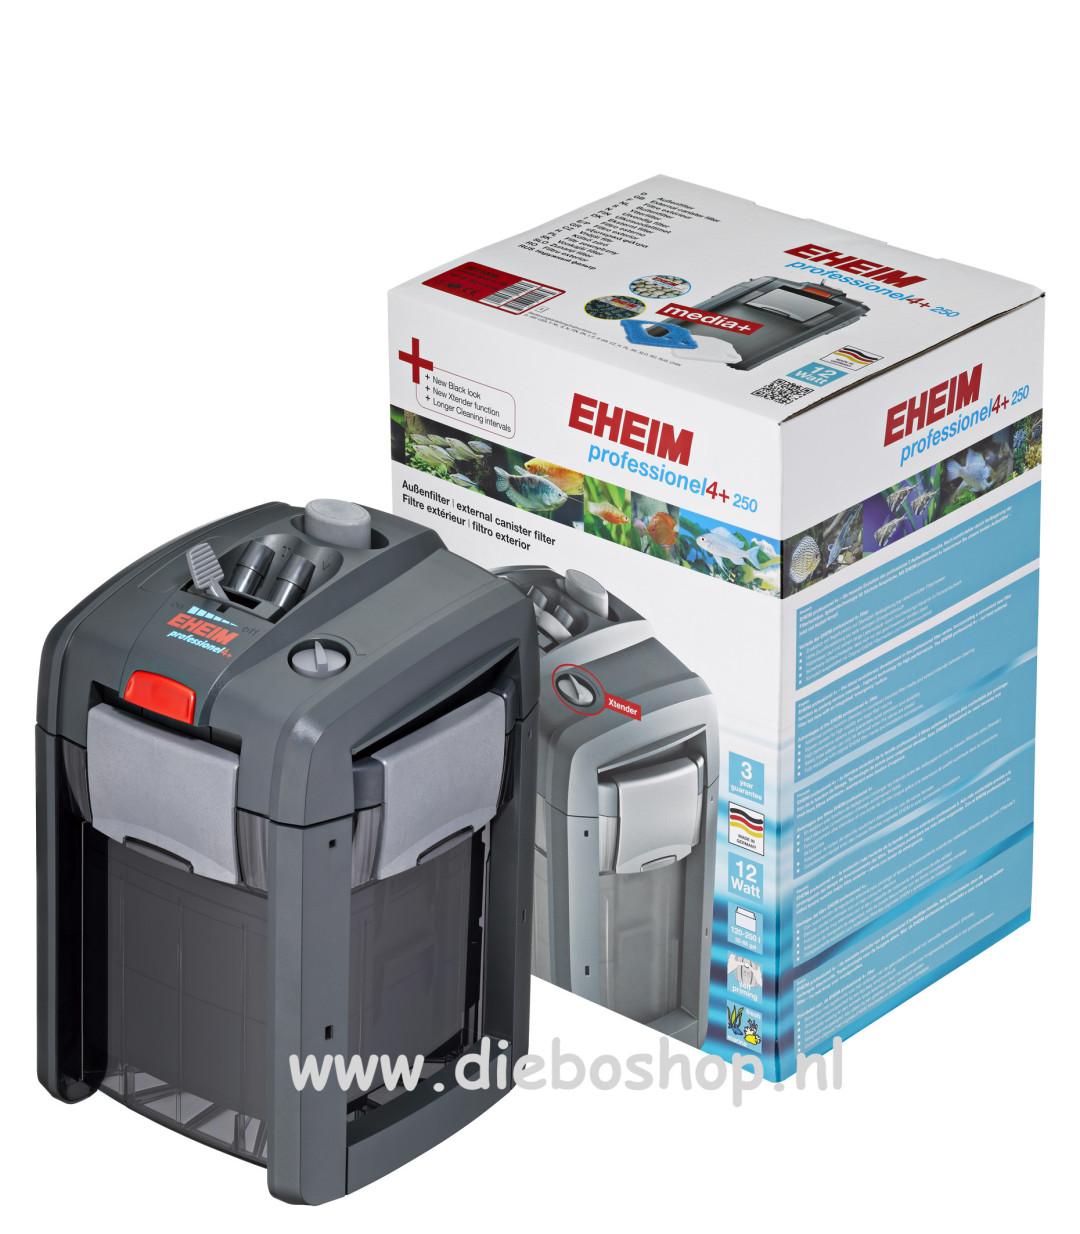 Eheim Filter Prof 4+ 250 2271.020